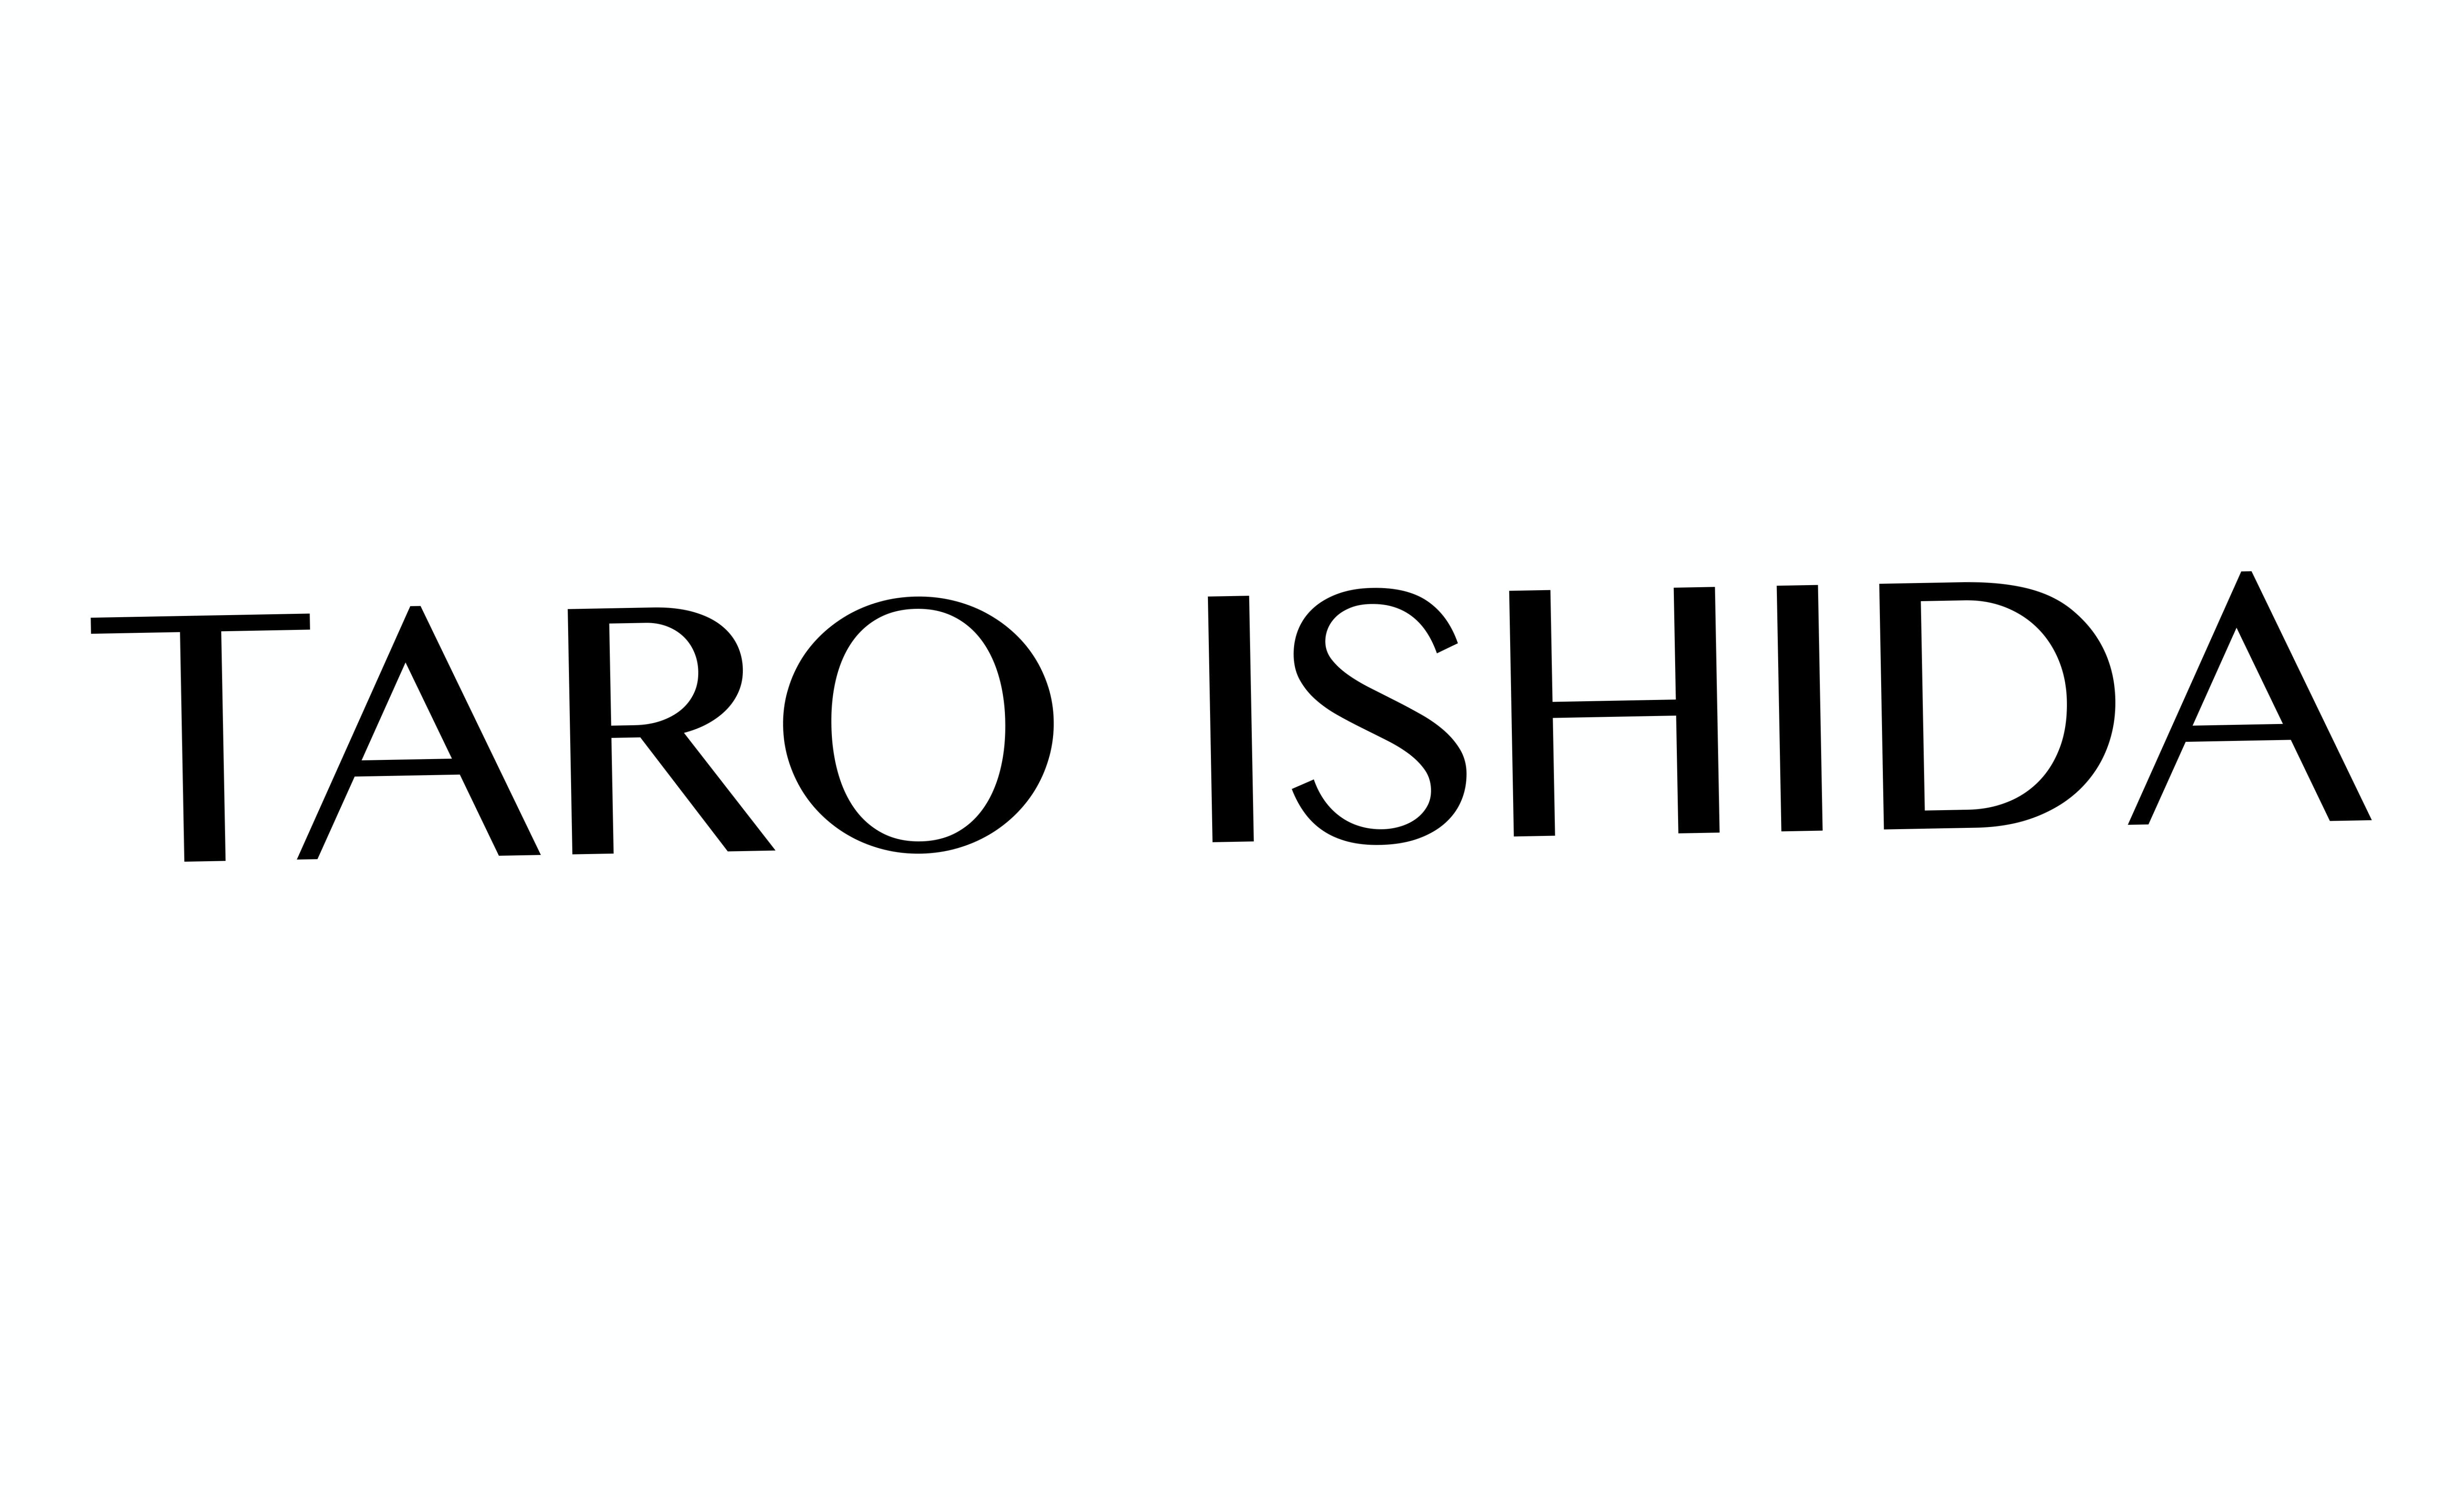 Taro Ishida company logo